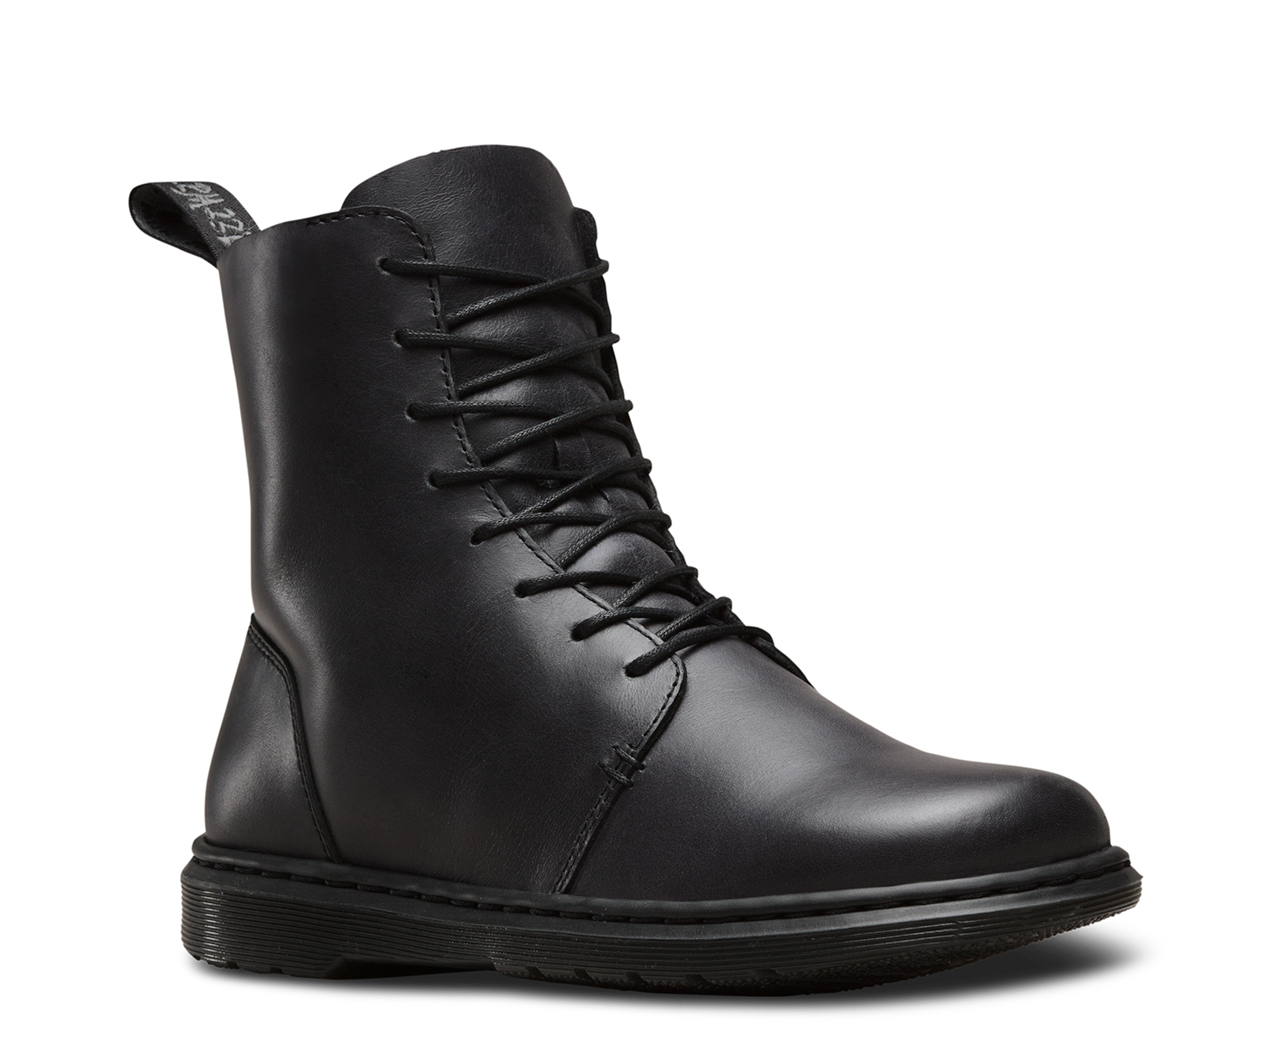 Danica New Arrivals Women S Boots Canada